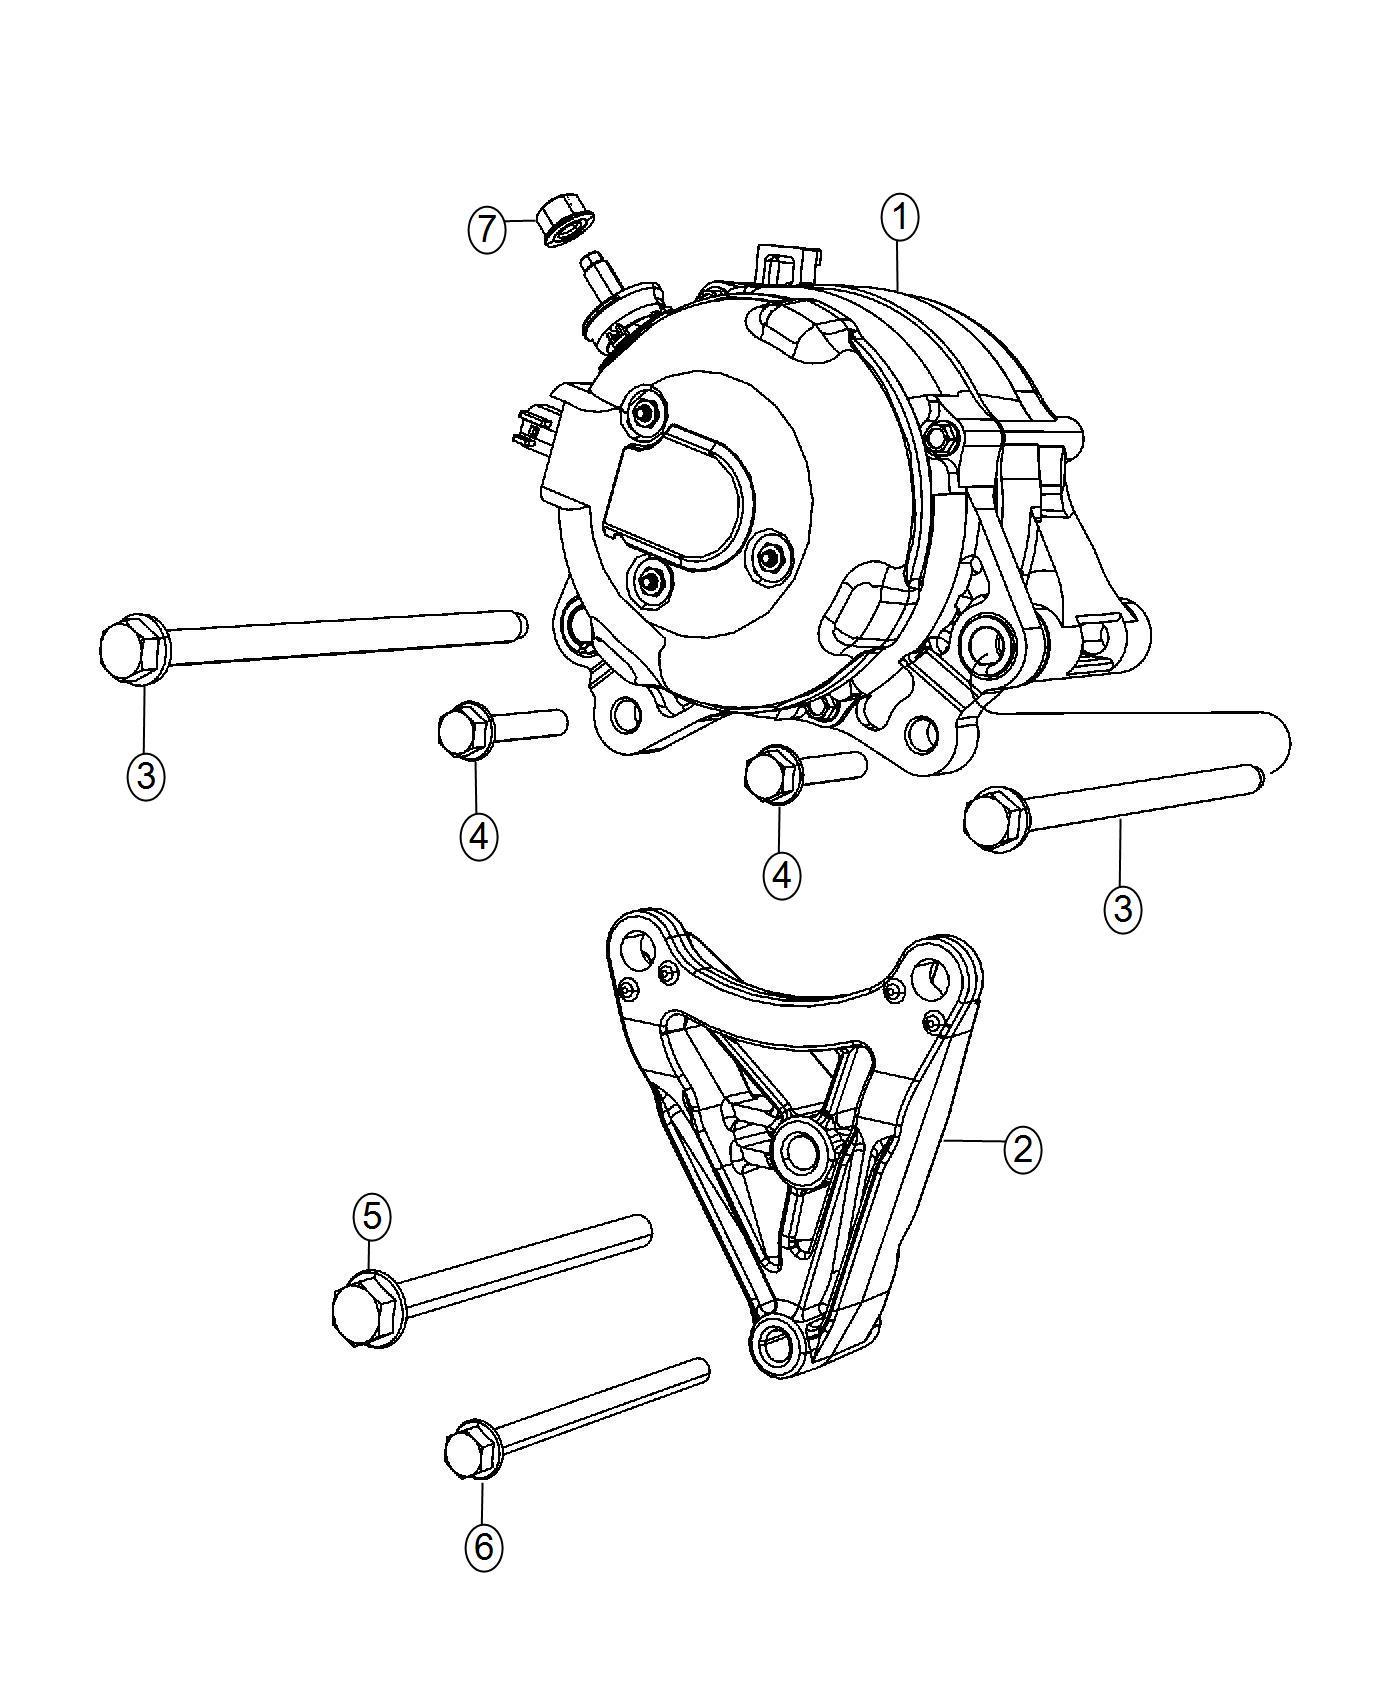 Jeep Wrangler Bracket Alternator Complete Chassis